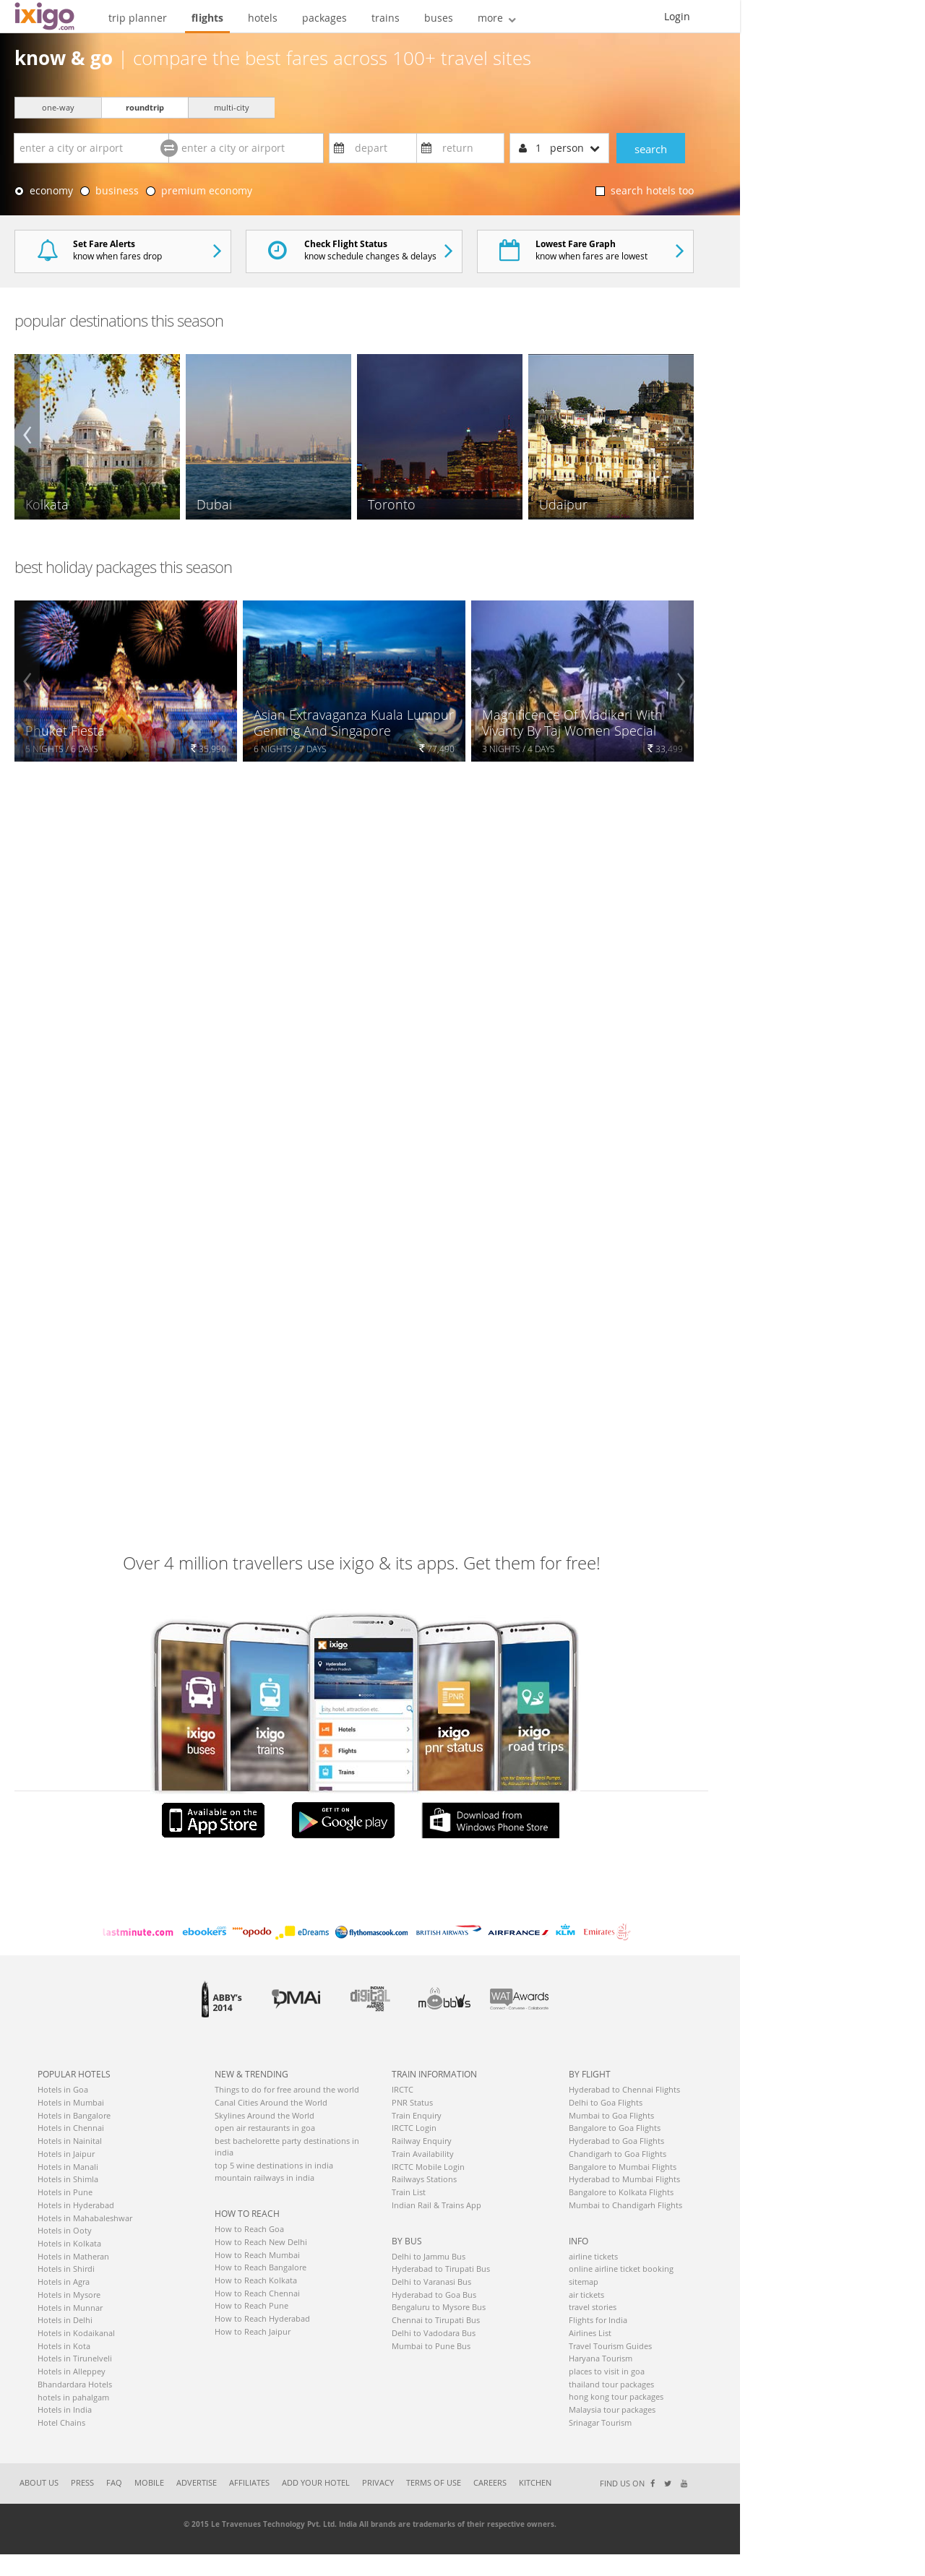 ixigo Competitors, Revenue and Employees - Owler Company Profile